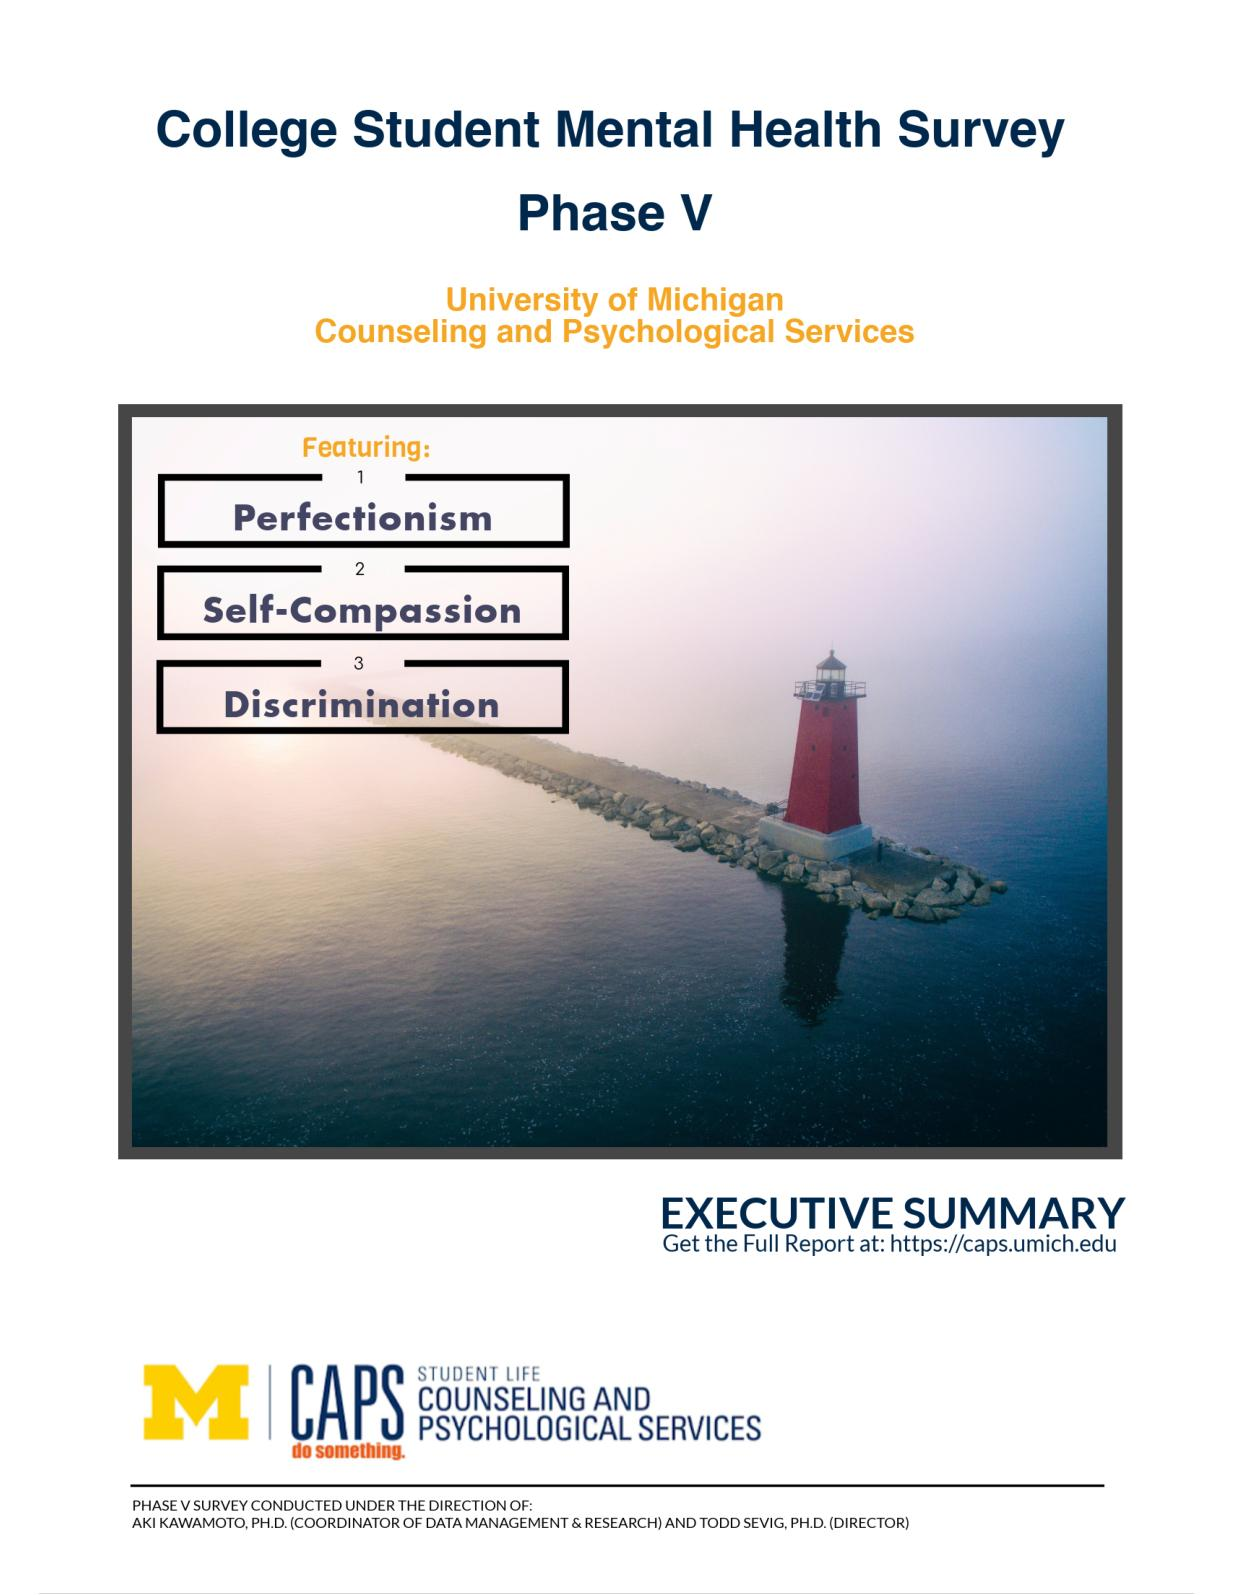 College Student Mental Health Survey: Phase V